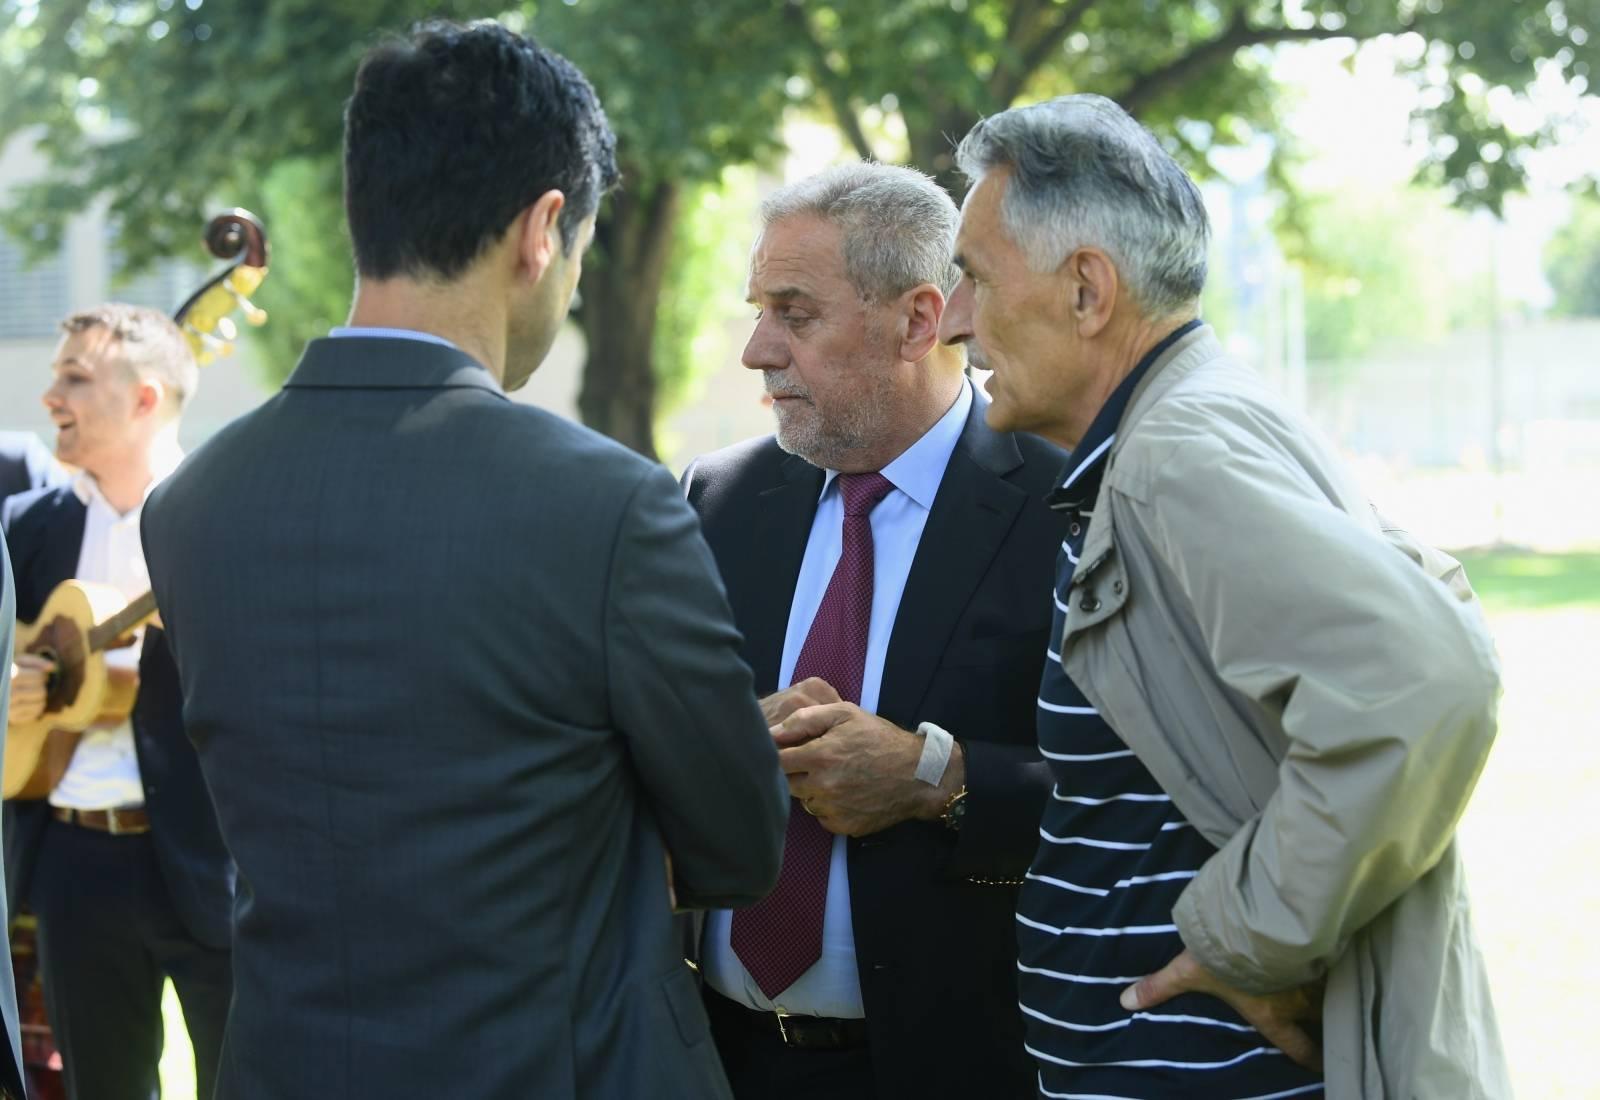 Zagreb: Gradonačelnik Bandić jutros je bio na Rebru te mu je na ruci ostao flaster